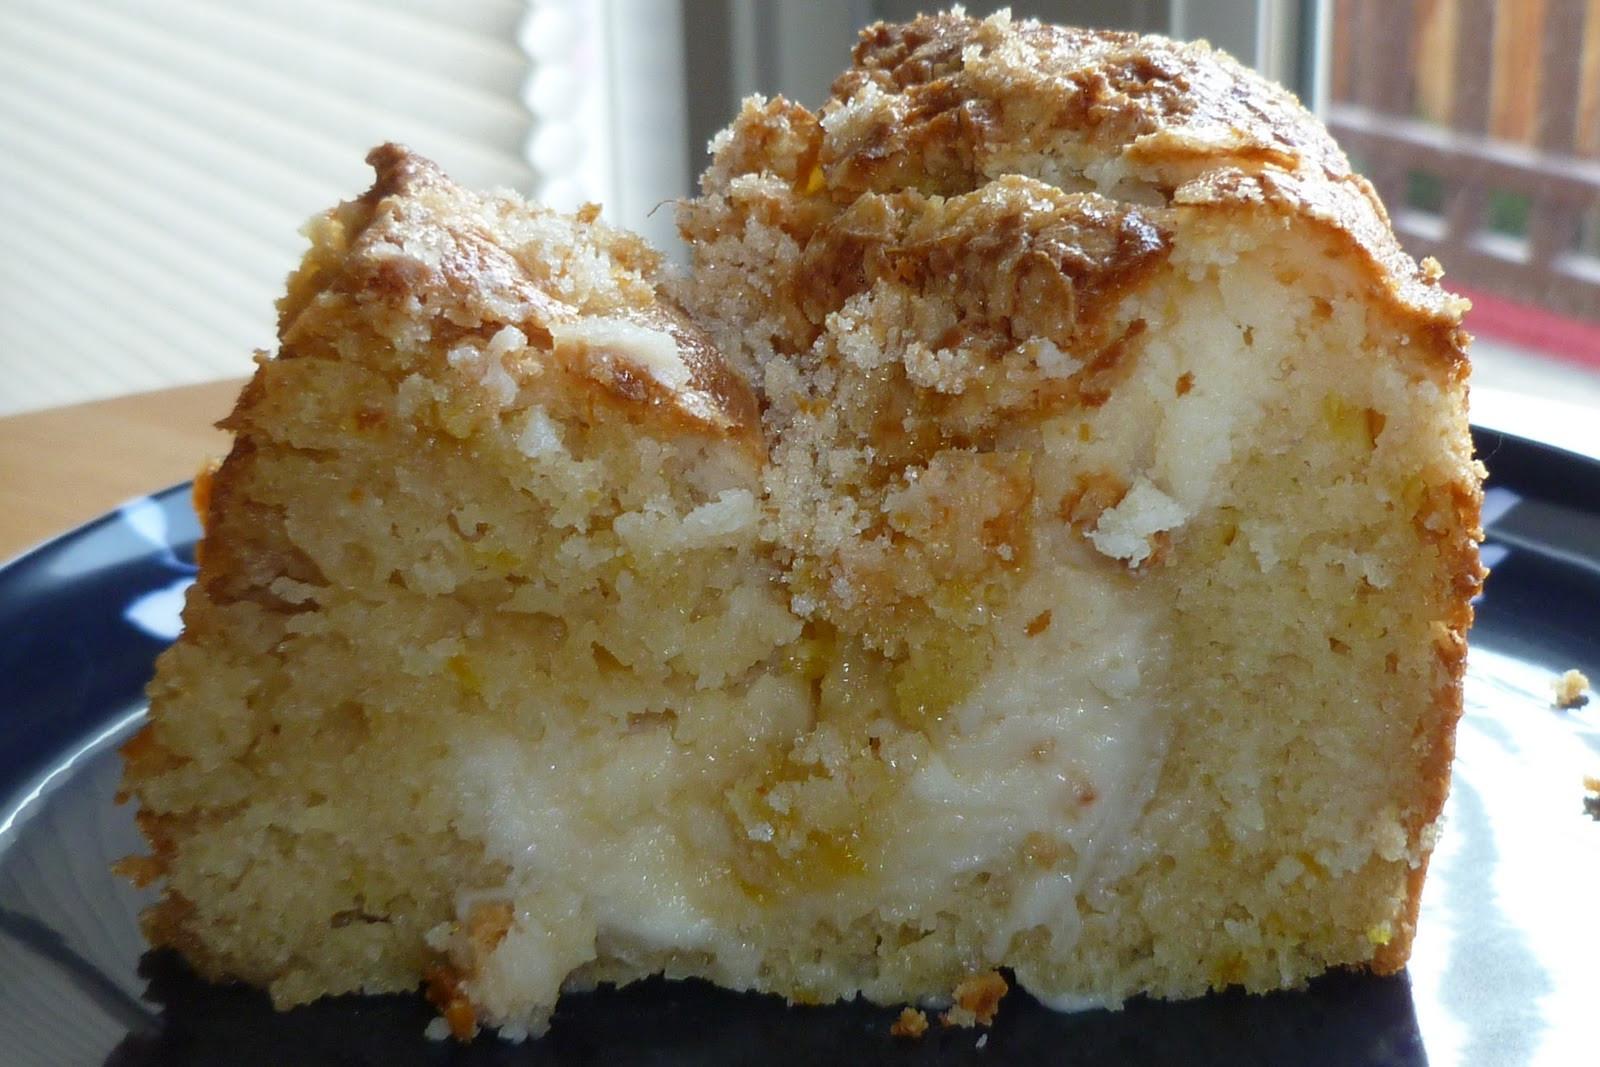 Cream Cheese Coffee Cake  The Pastry Chef s Baking Cream Cheese Coffee Cake